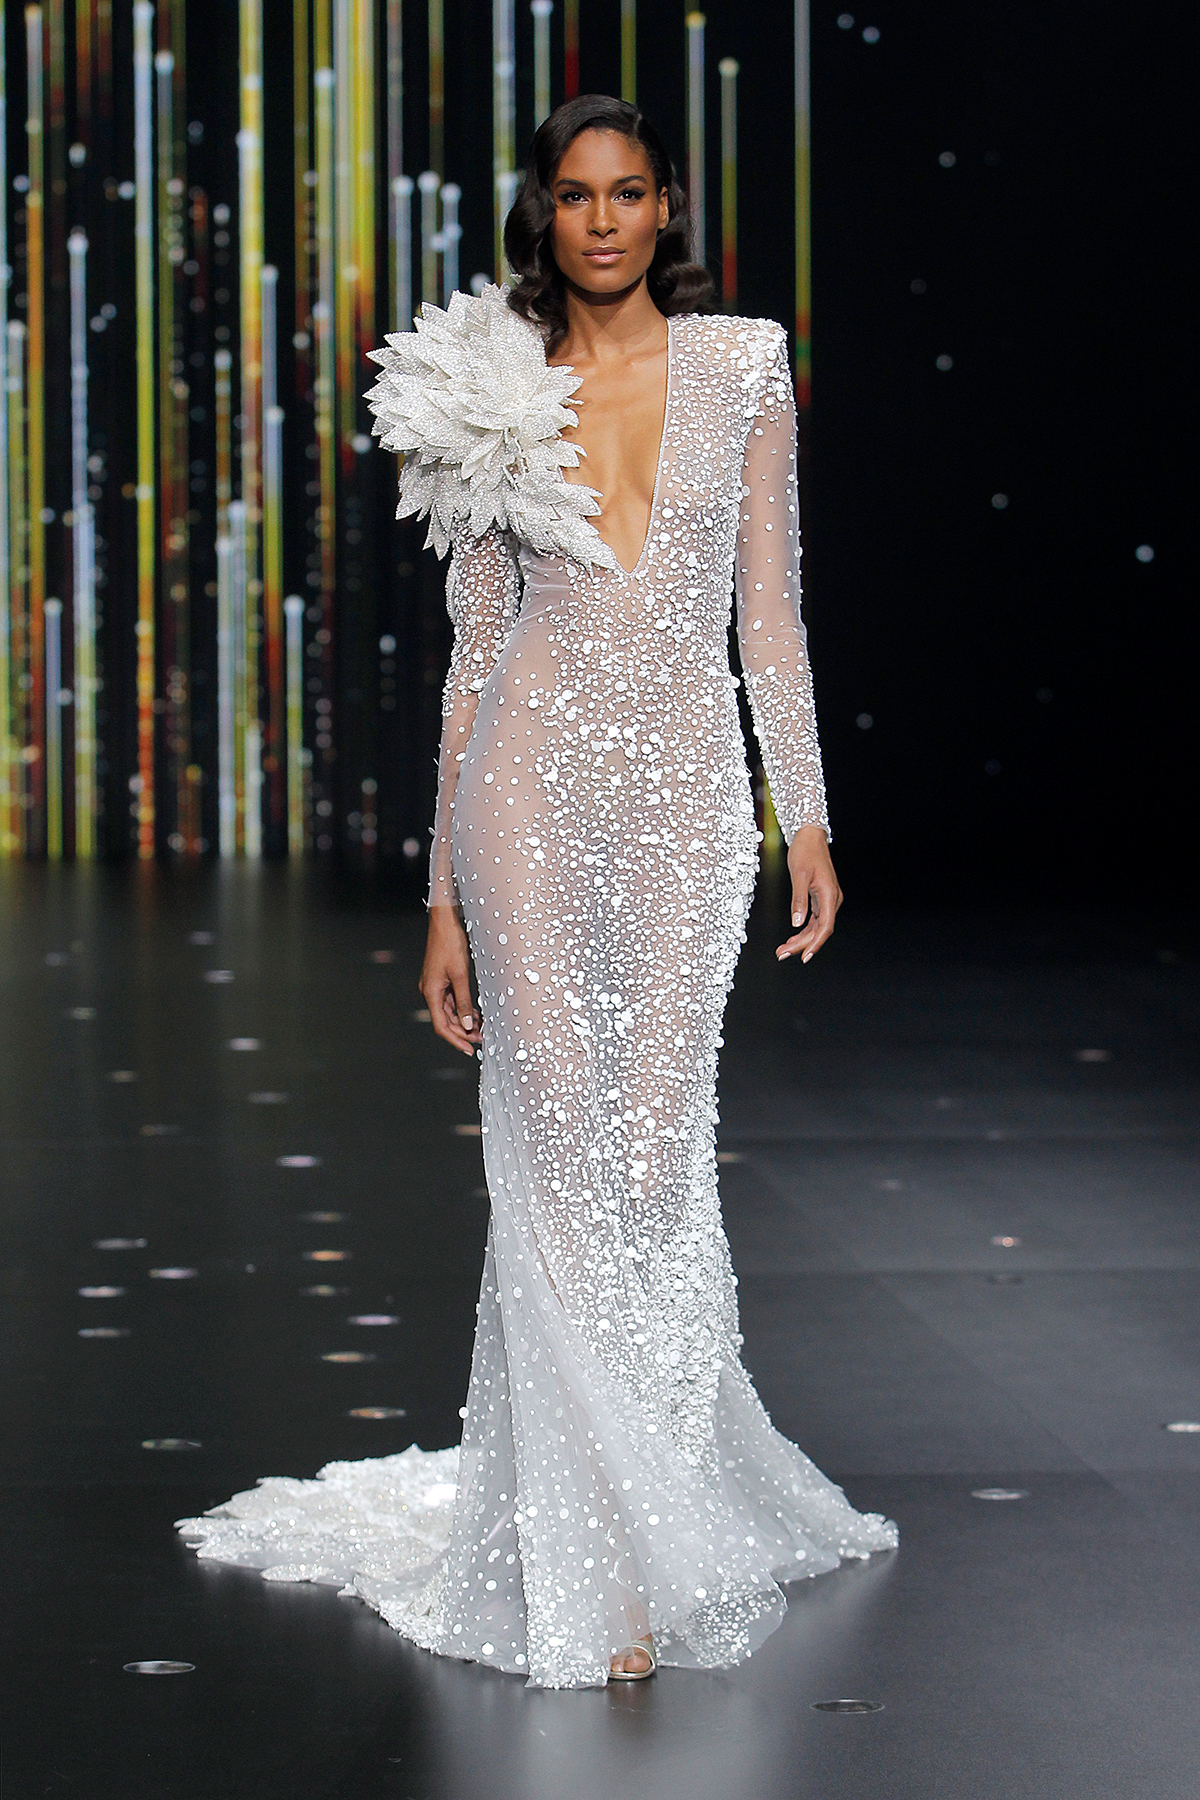 wedding pronovias dress bridal runway week barcelona collection dresses stars bride spring beyond brides atelier dressed